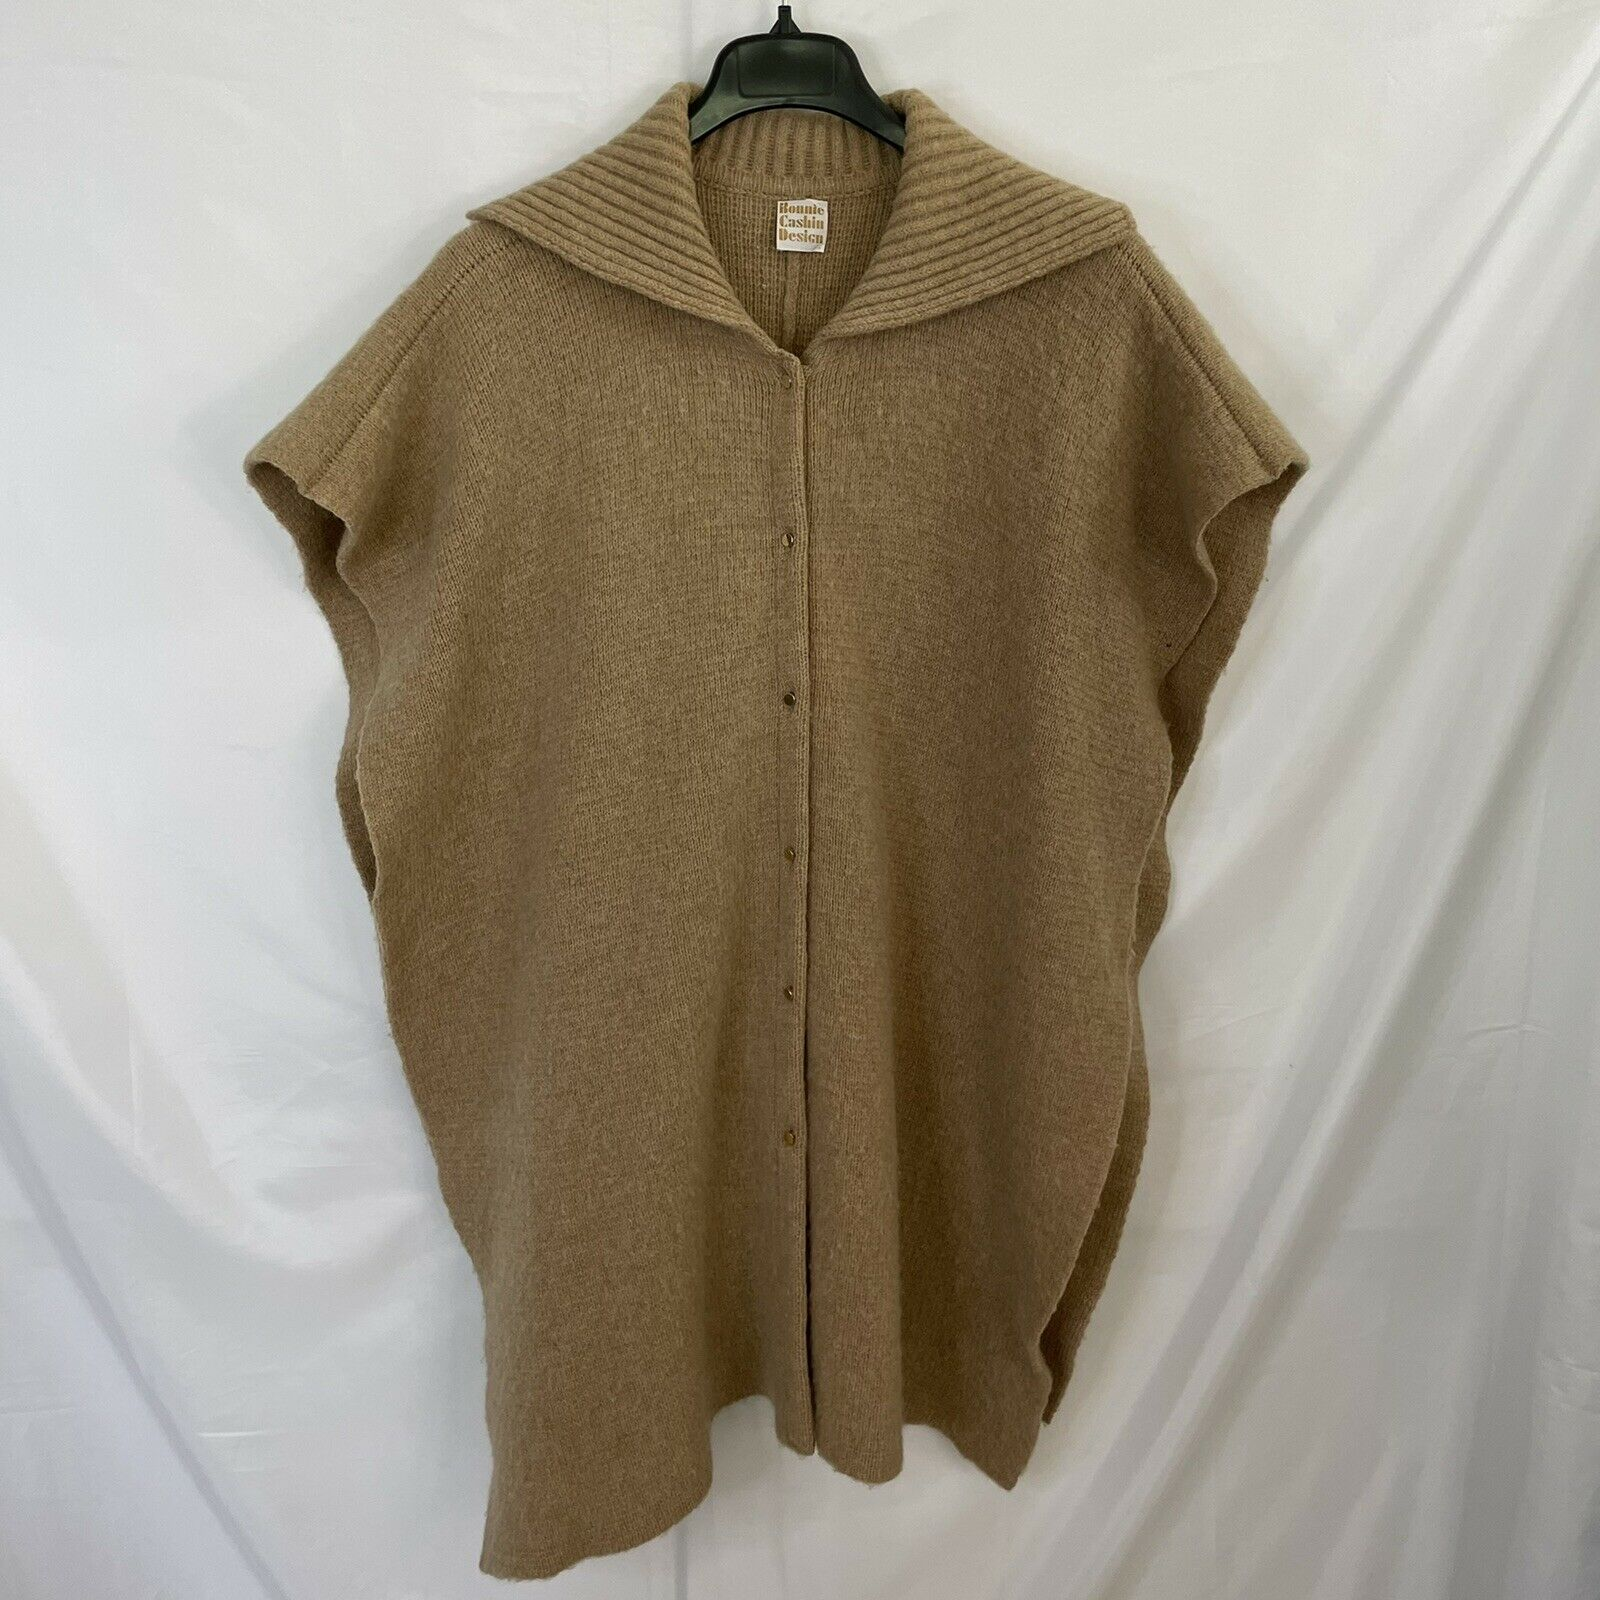 Bonnie Cashin Camel Knit Sweater Cape Poncho Coat - image 2